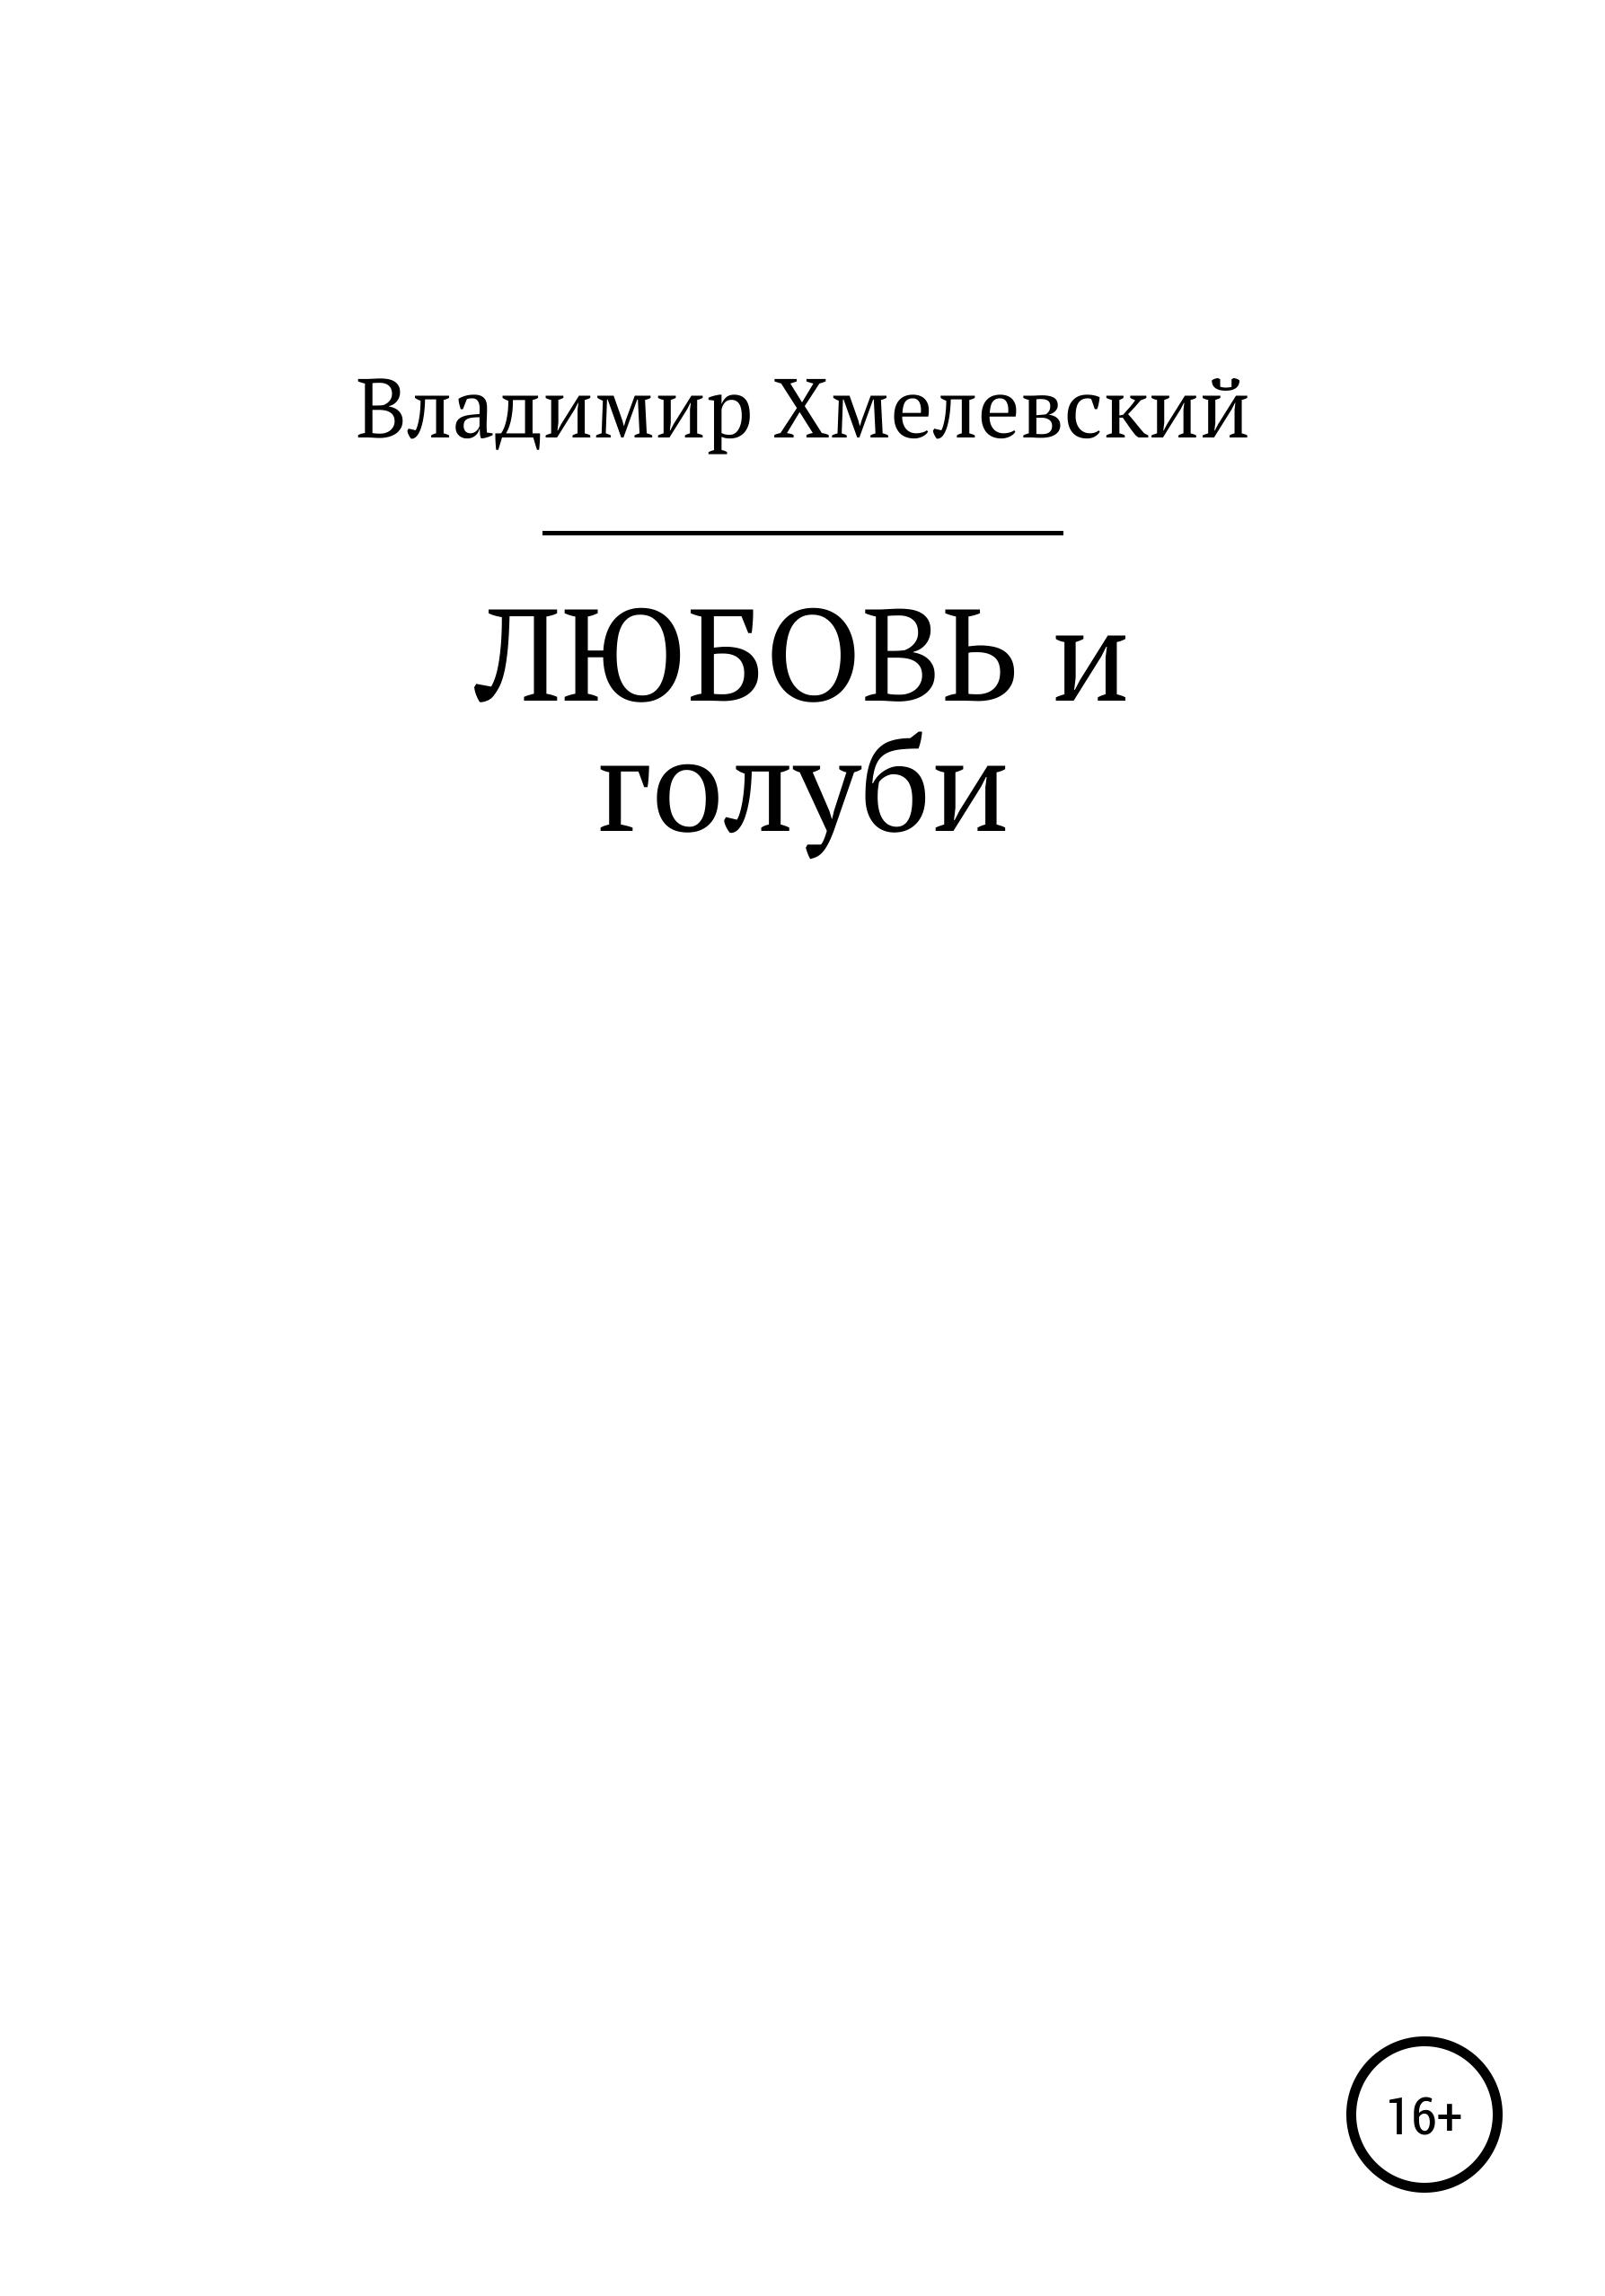 Владимир Хмелевский Любовь и голуби любовь и голуби 2019 02 09t19 00